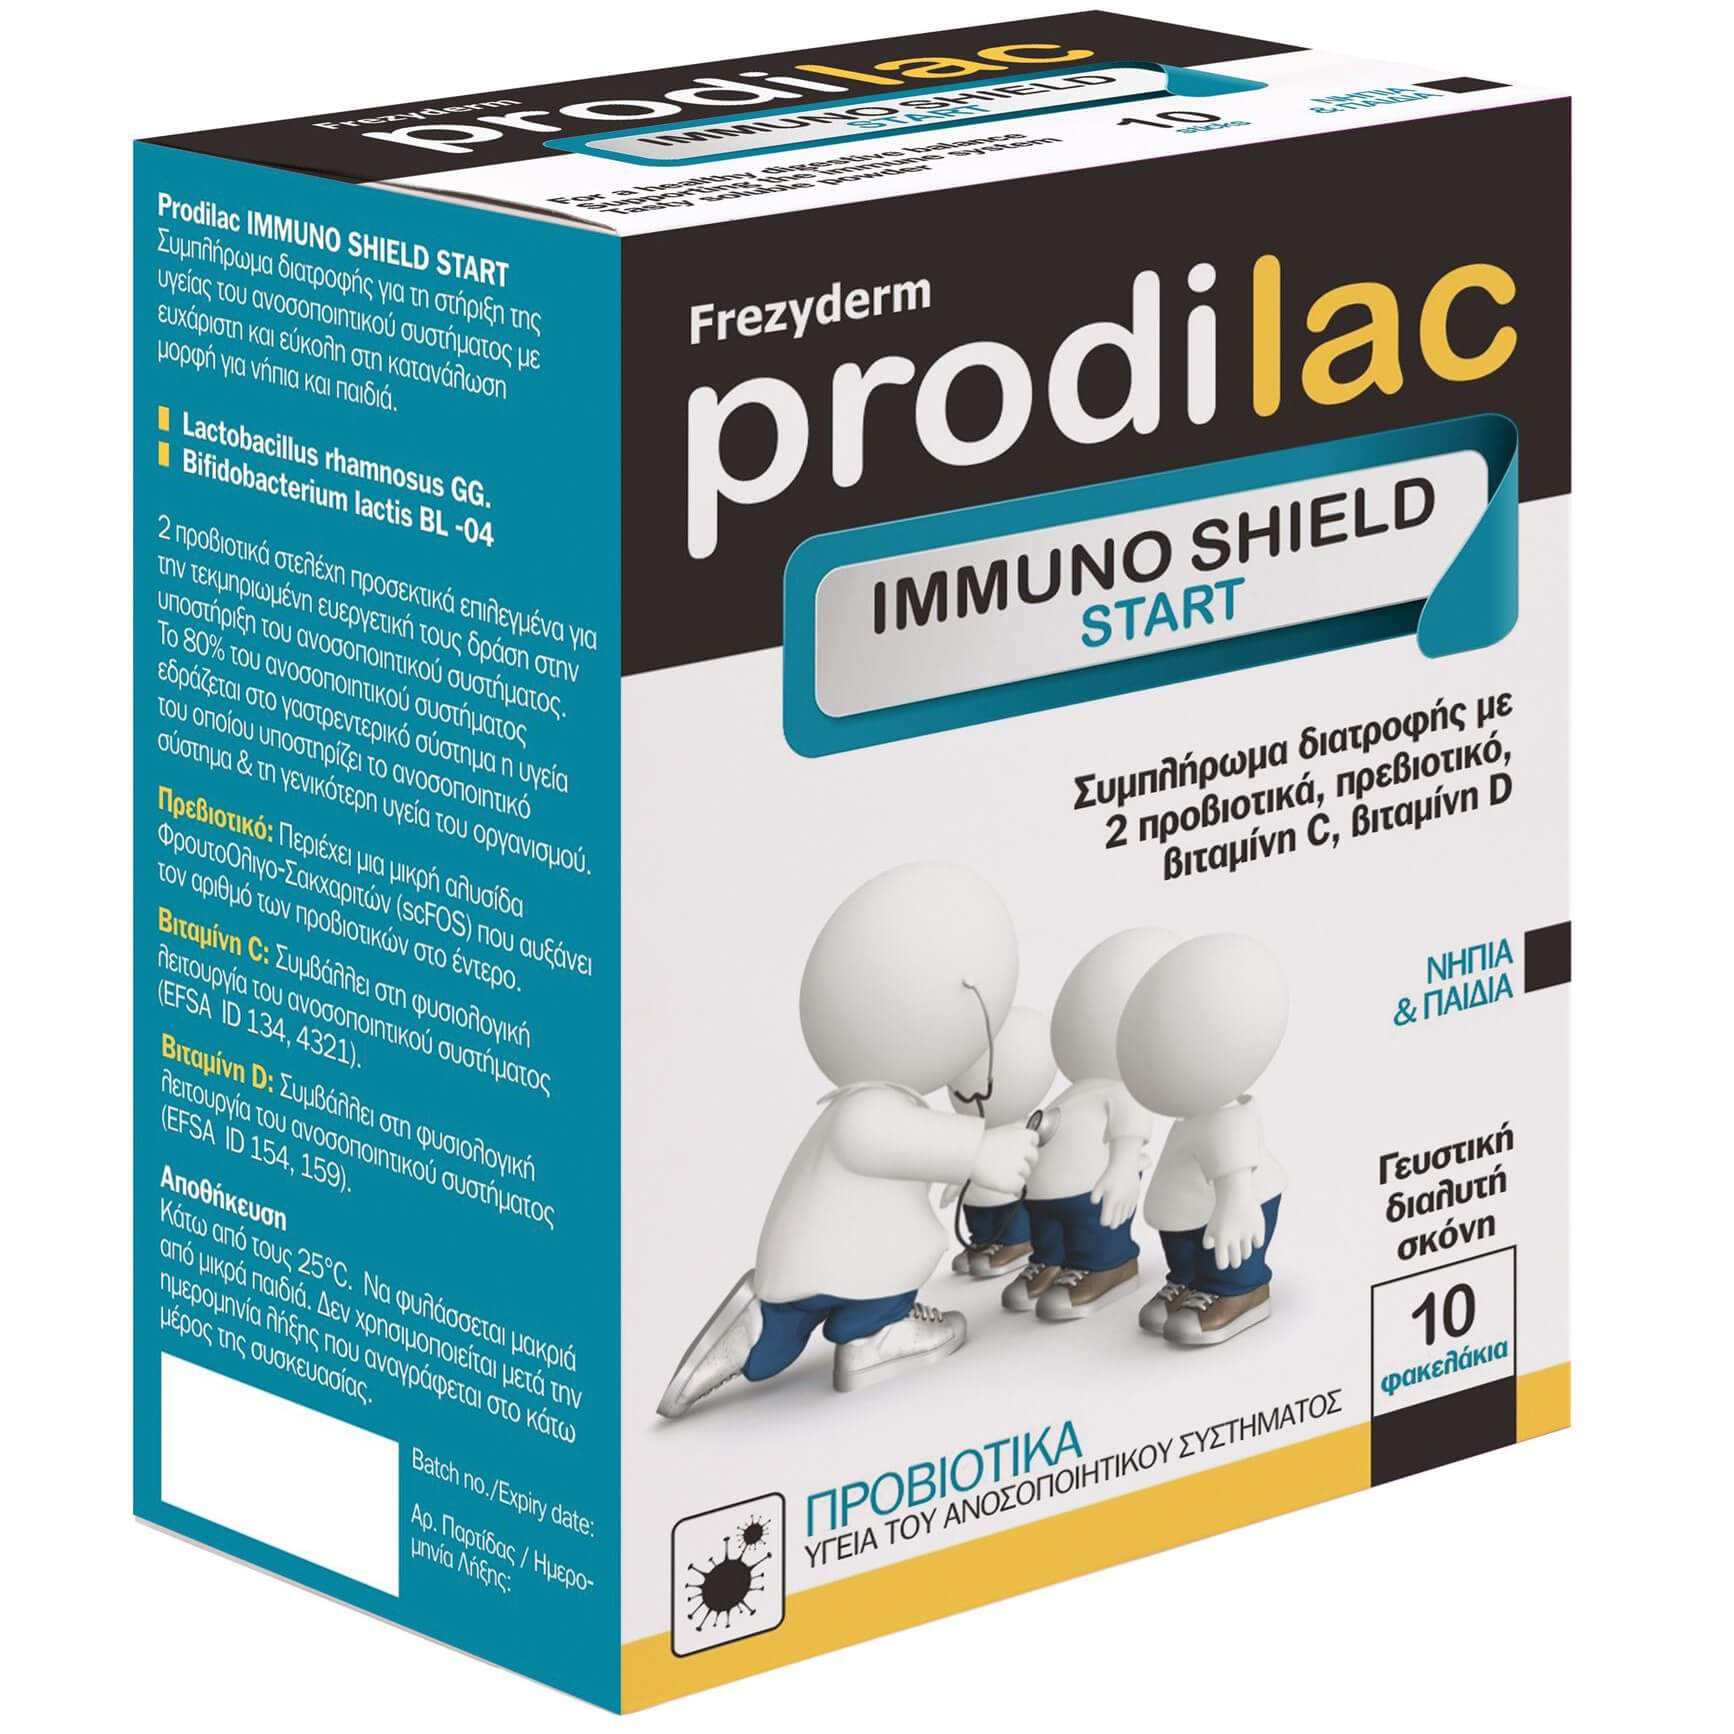 Frezyderm Prodilac Immuno Shield Start Συμπλήρωμα Διατροφής 10 Φακελάκια